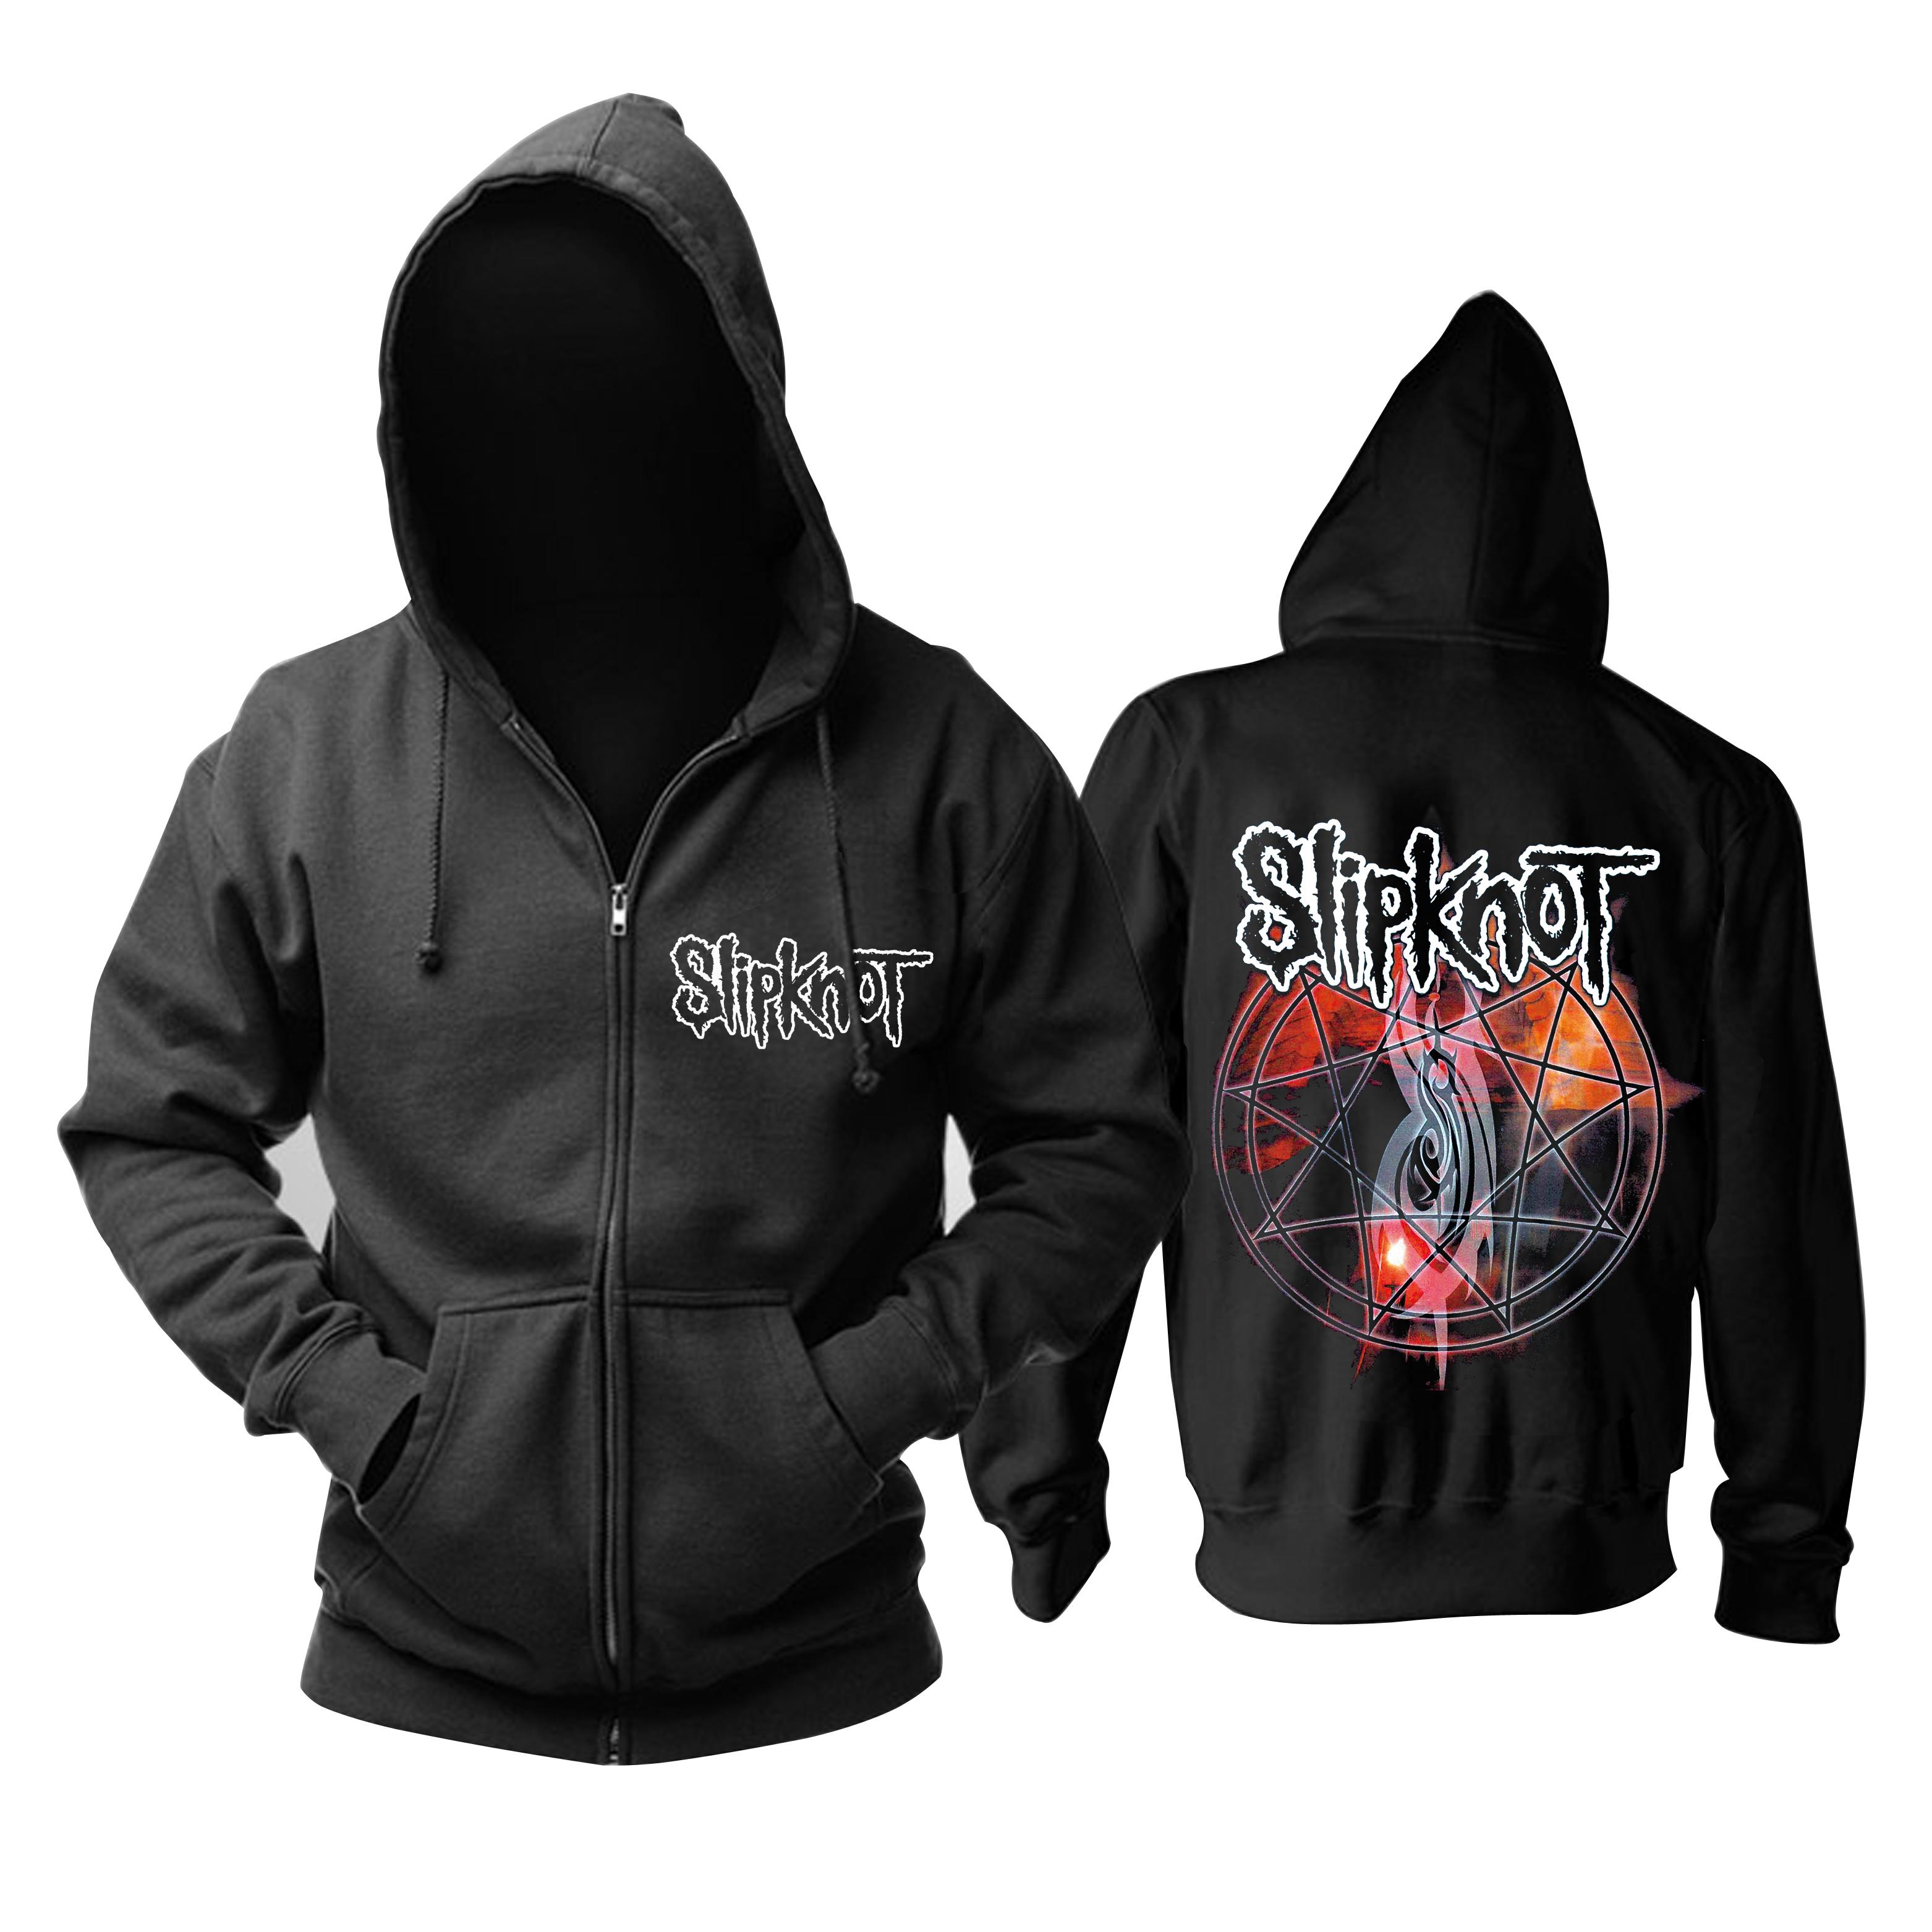 Merchandise Hoodie Slipknot Symbol Band S Pullover